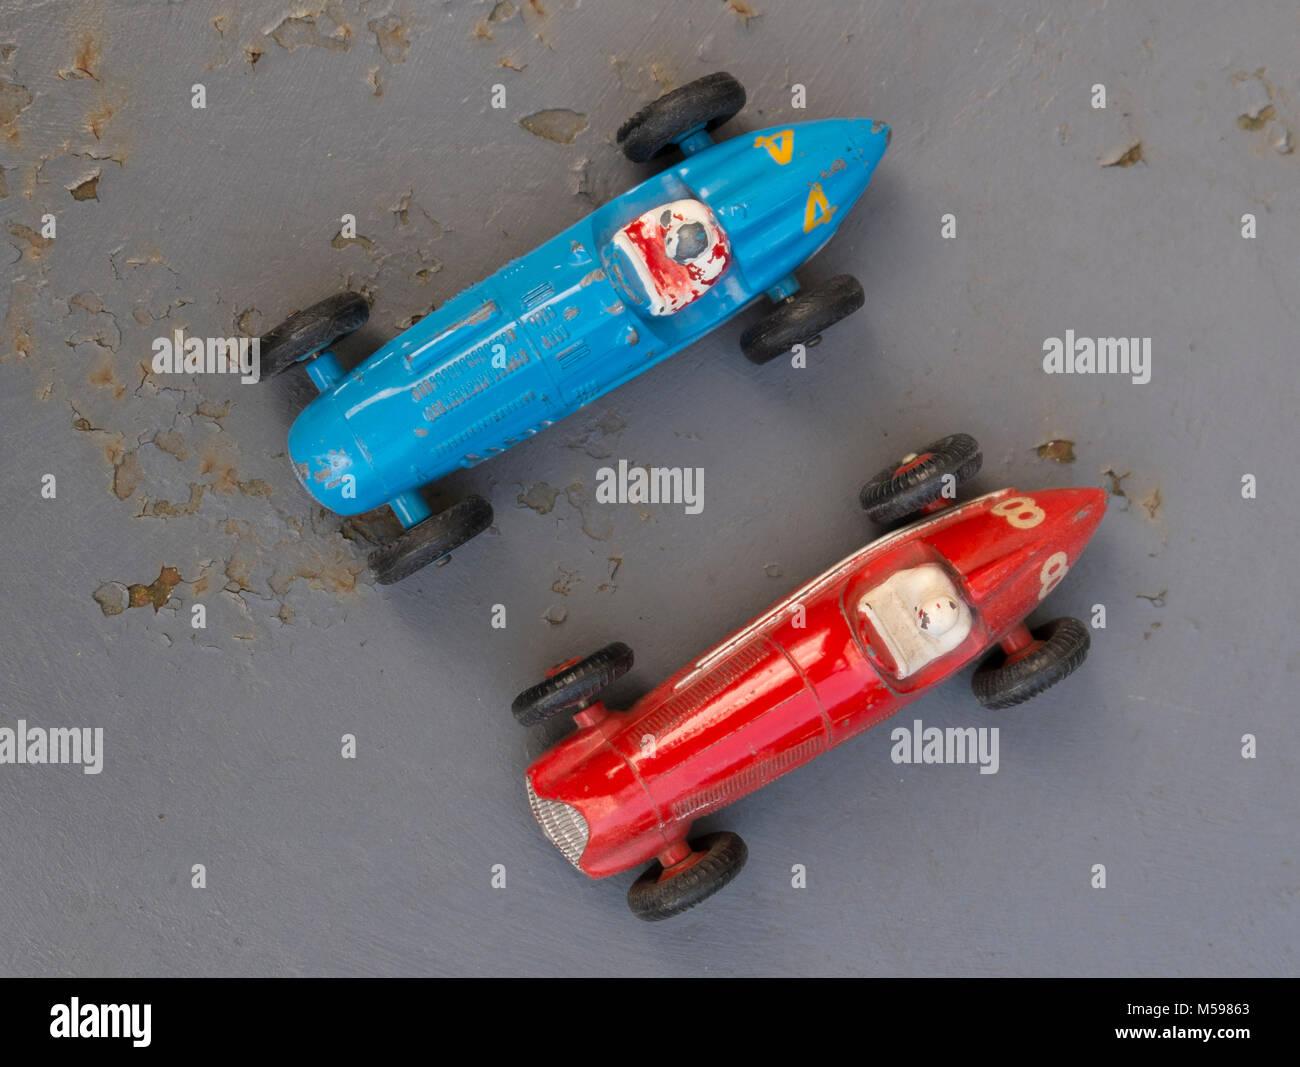 Talbot Lago and Alfa Romeo vintage Dinky toys on an old rusty metal garden table Stock Photo